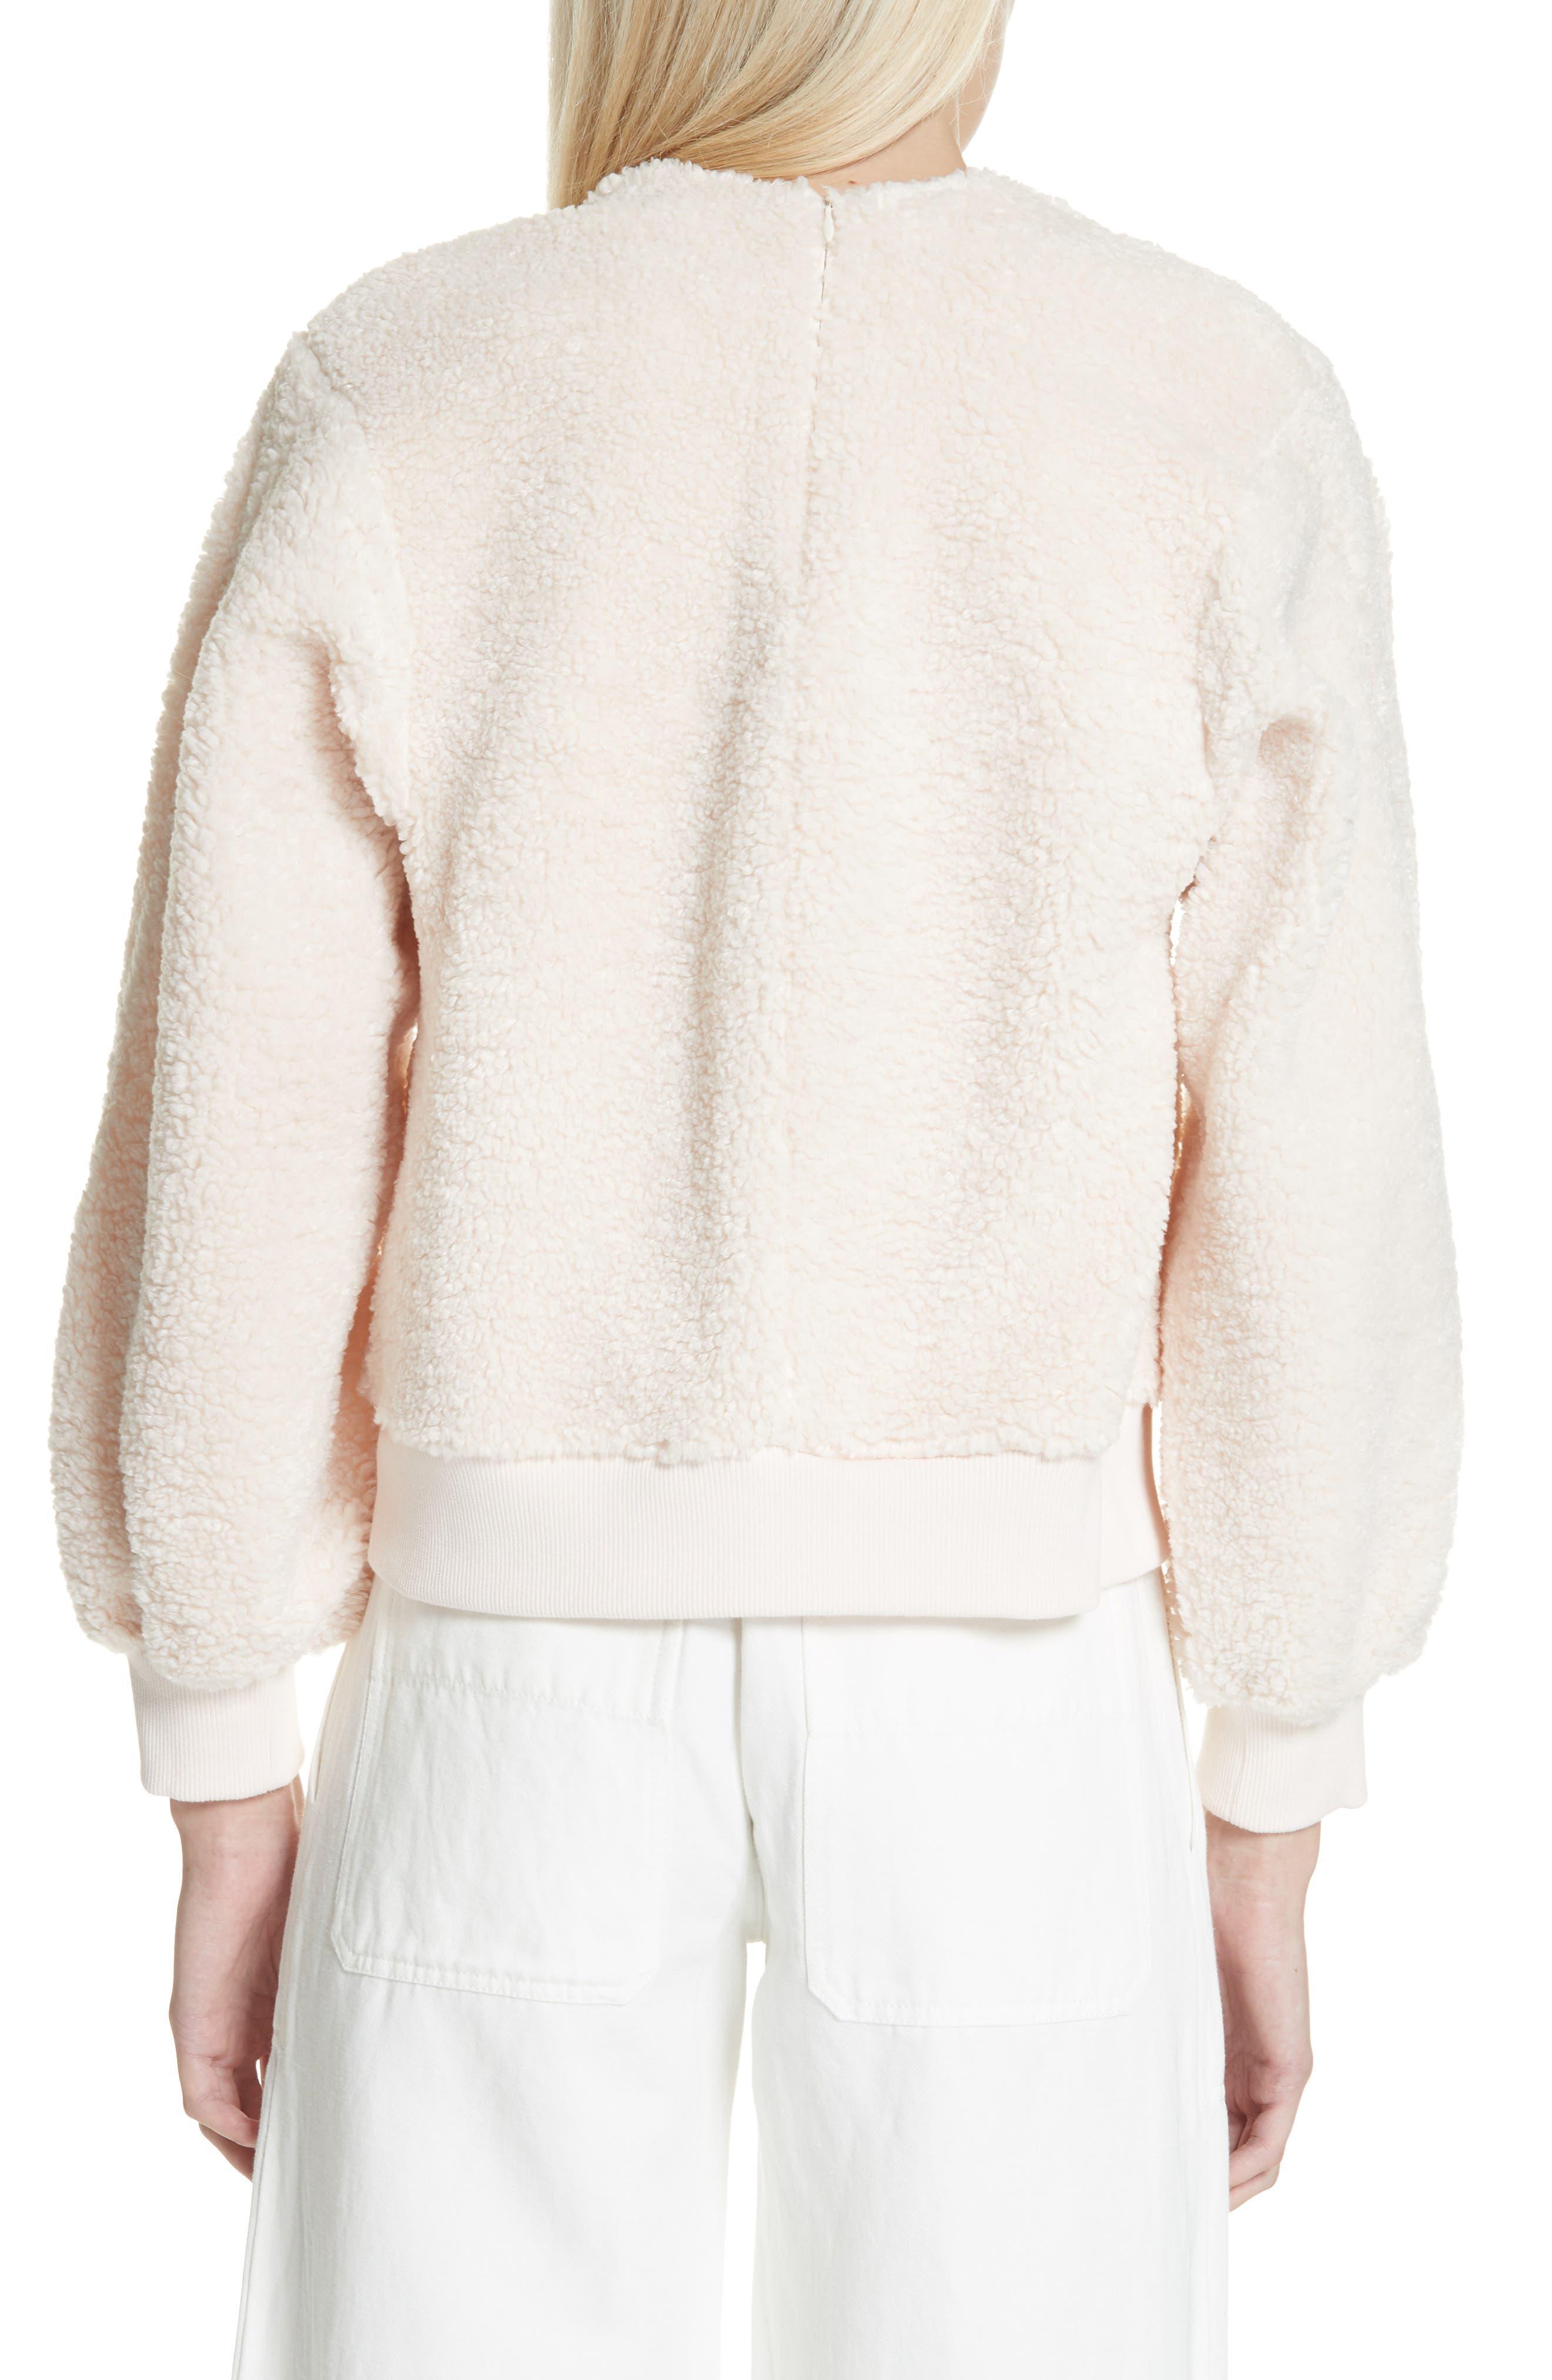 VINCE, Cozy Fleece Pullover, Alternate thumbnail 2, color, SOFT PINK